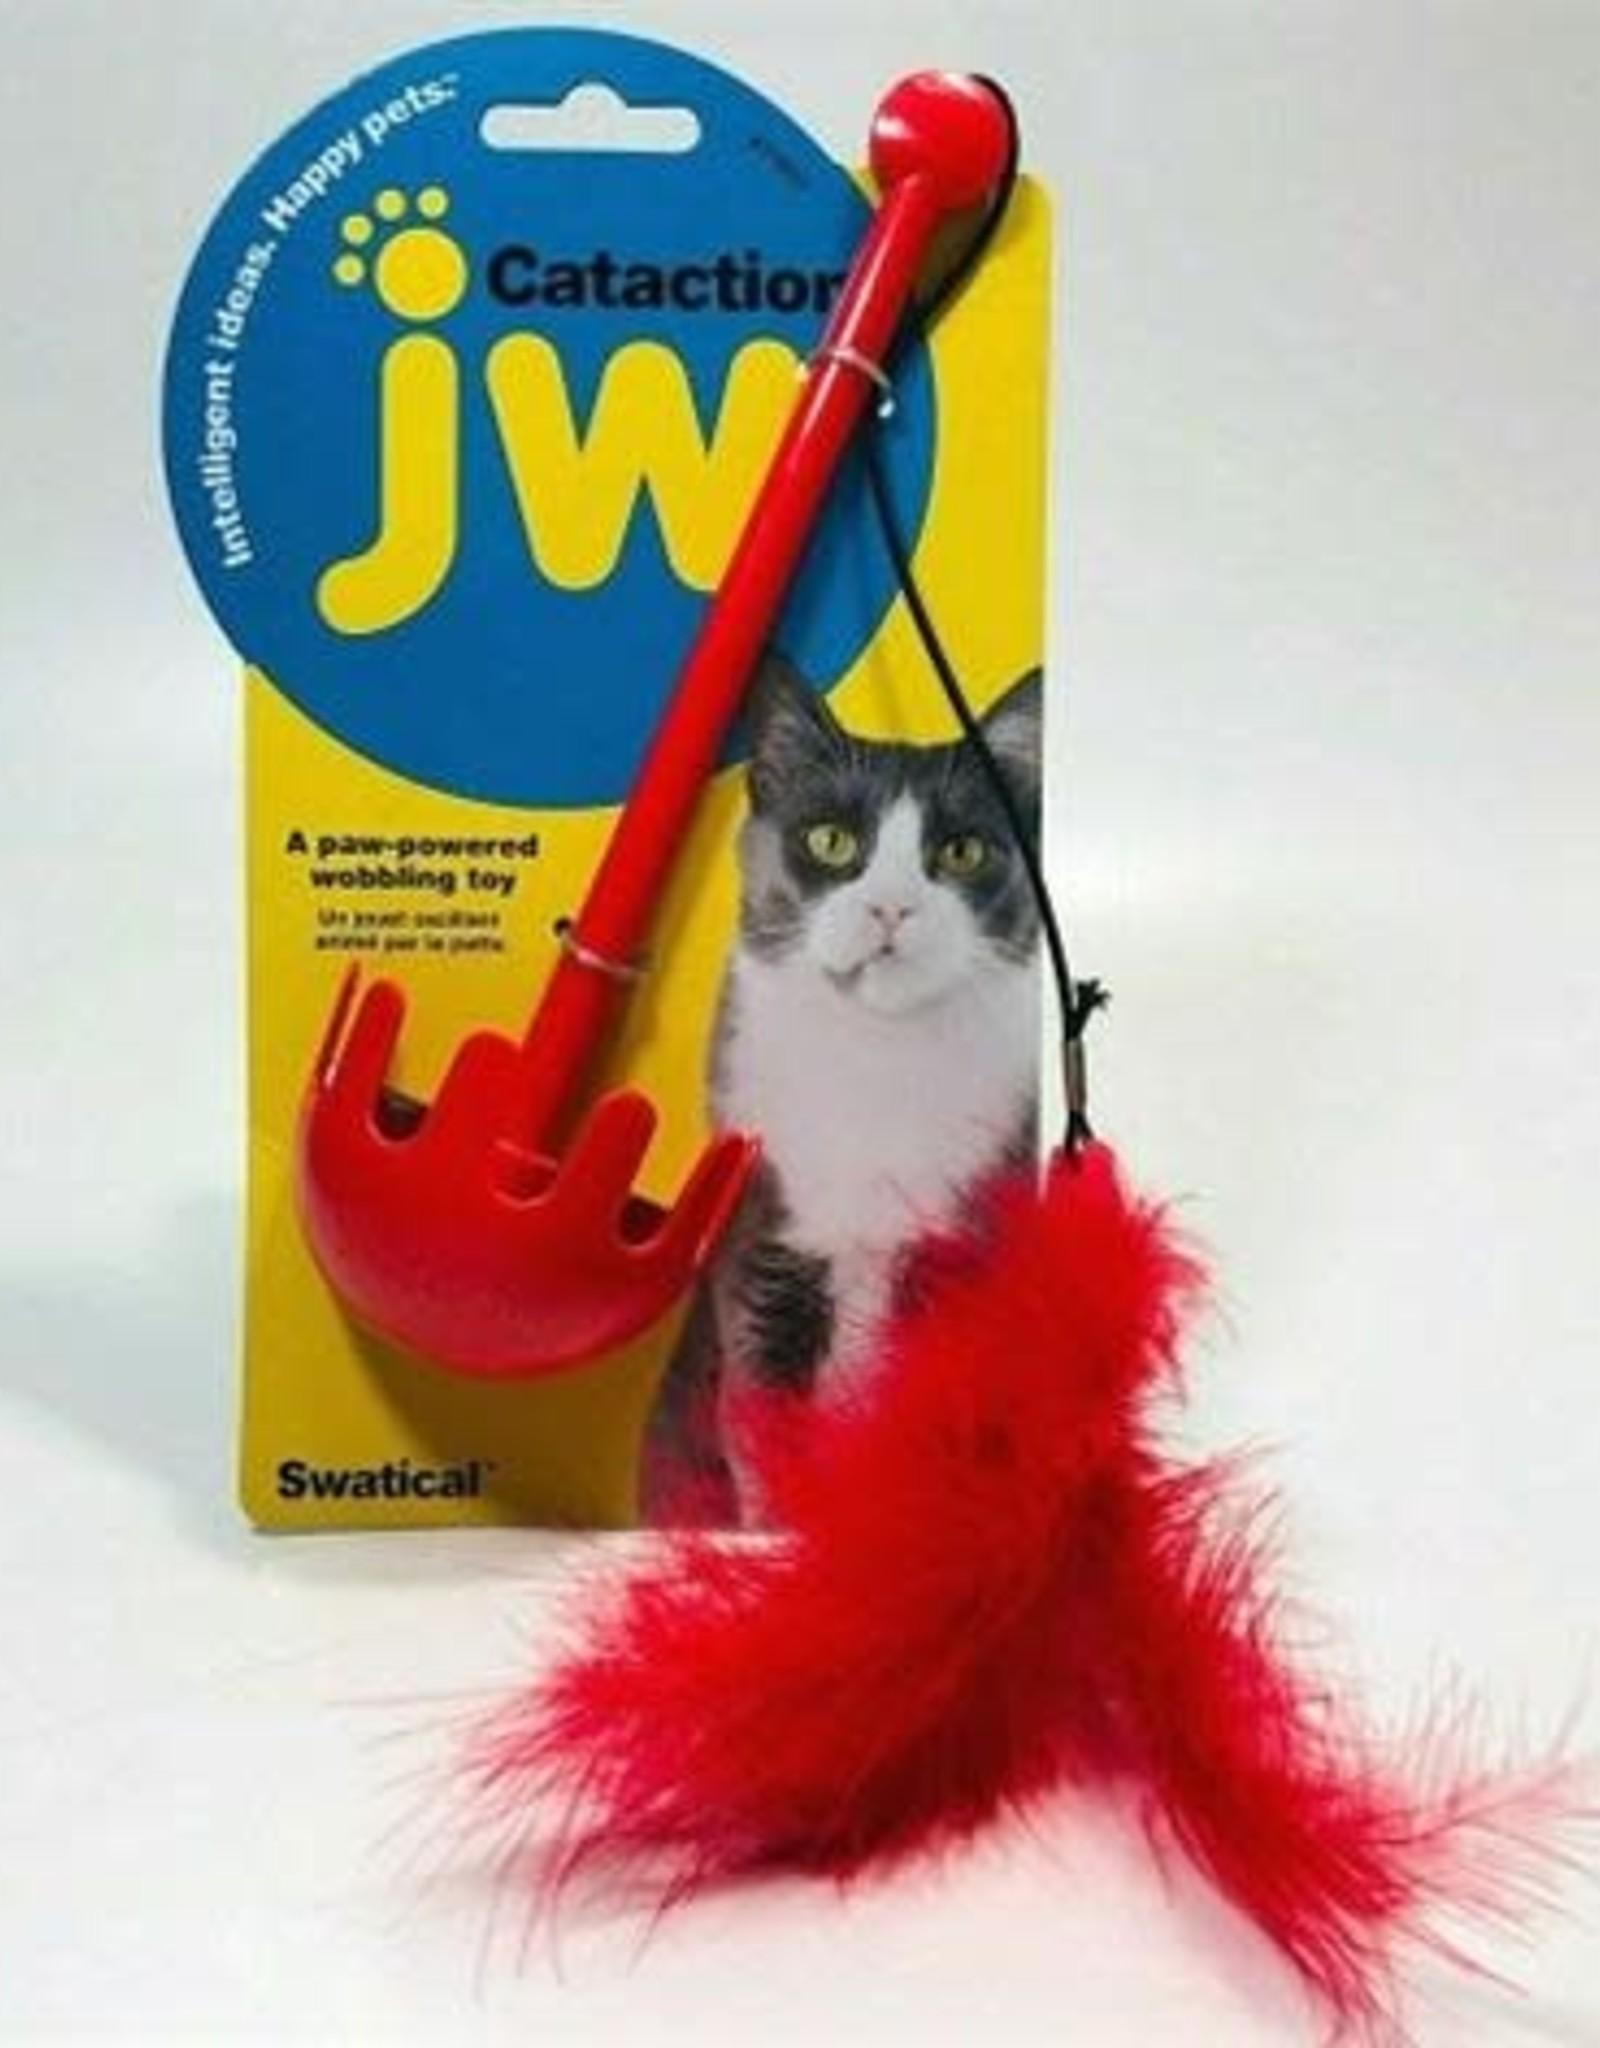 JW Pet CatAction Swatical Cat Toy